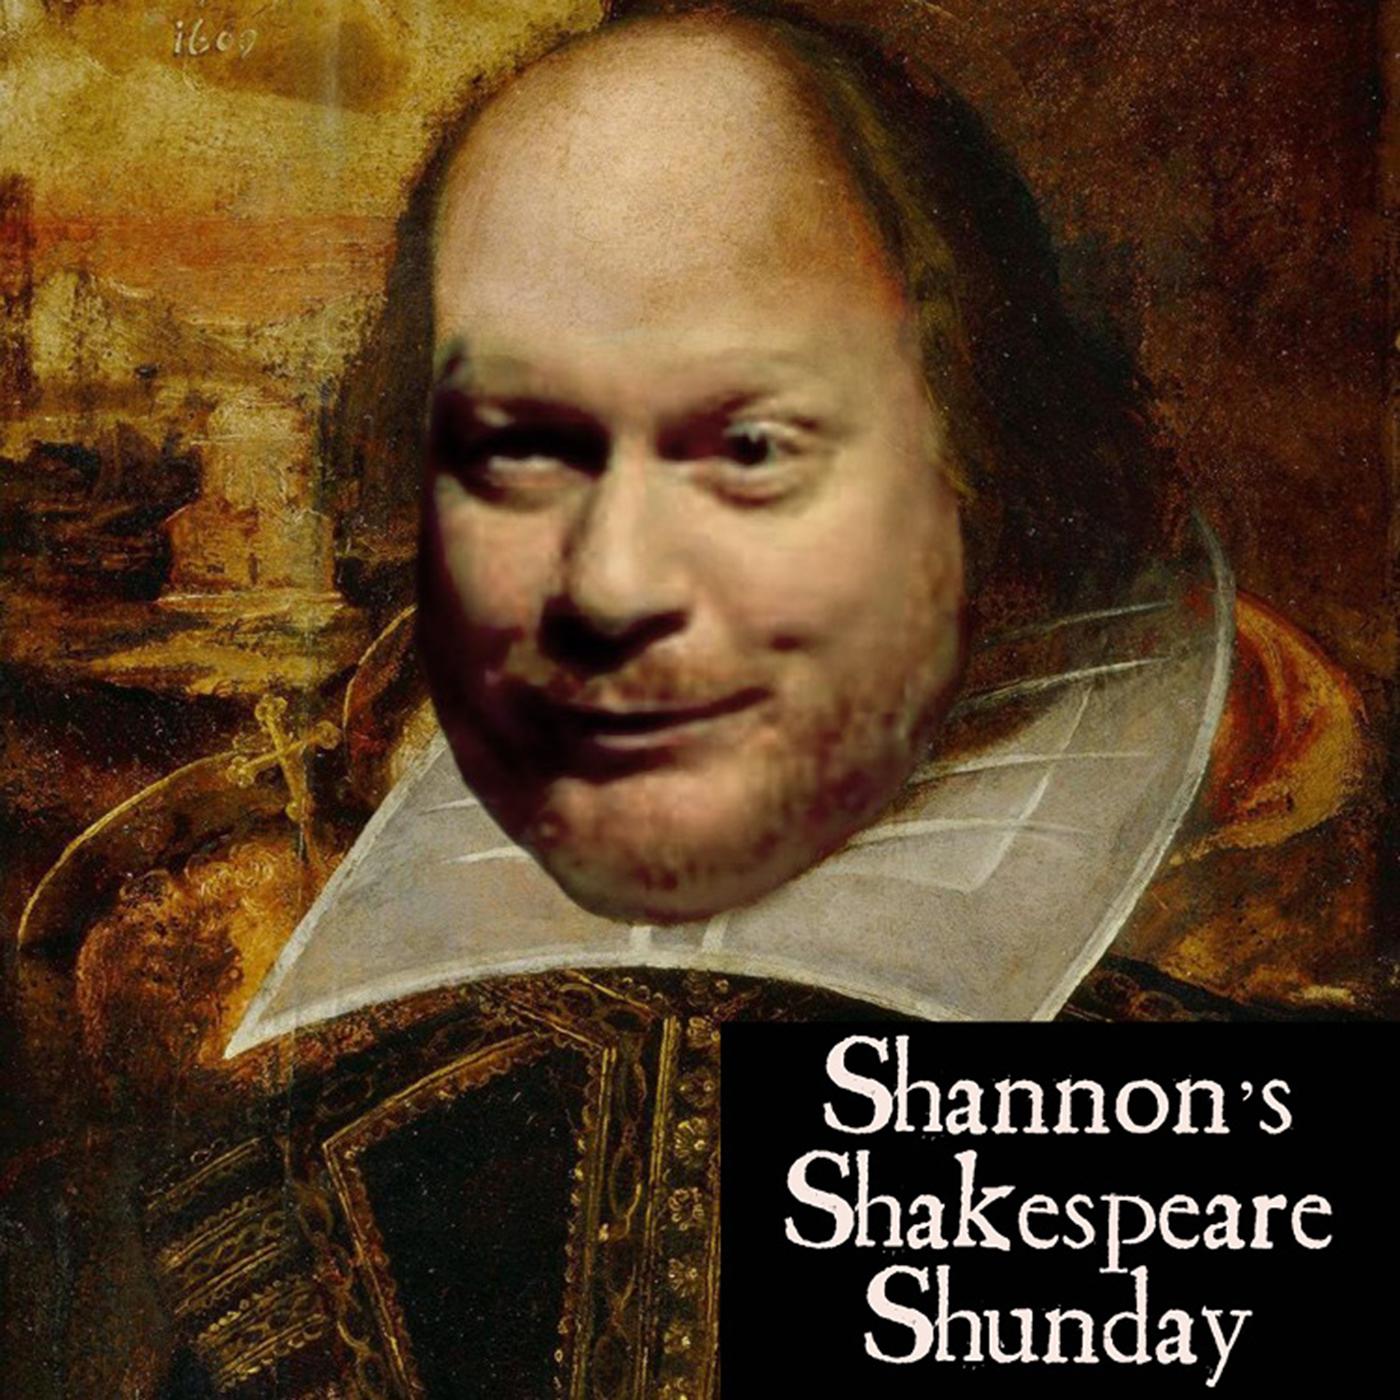 Shannon's Shakespeare Shunday